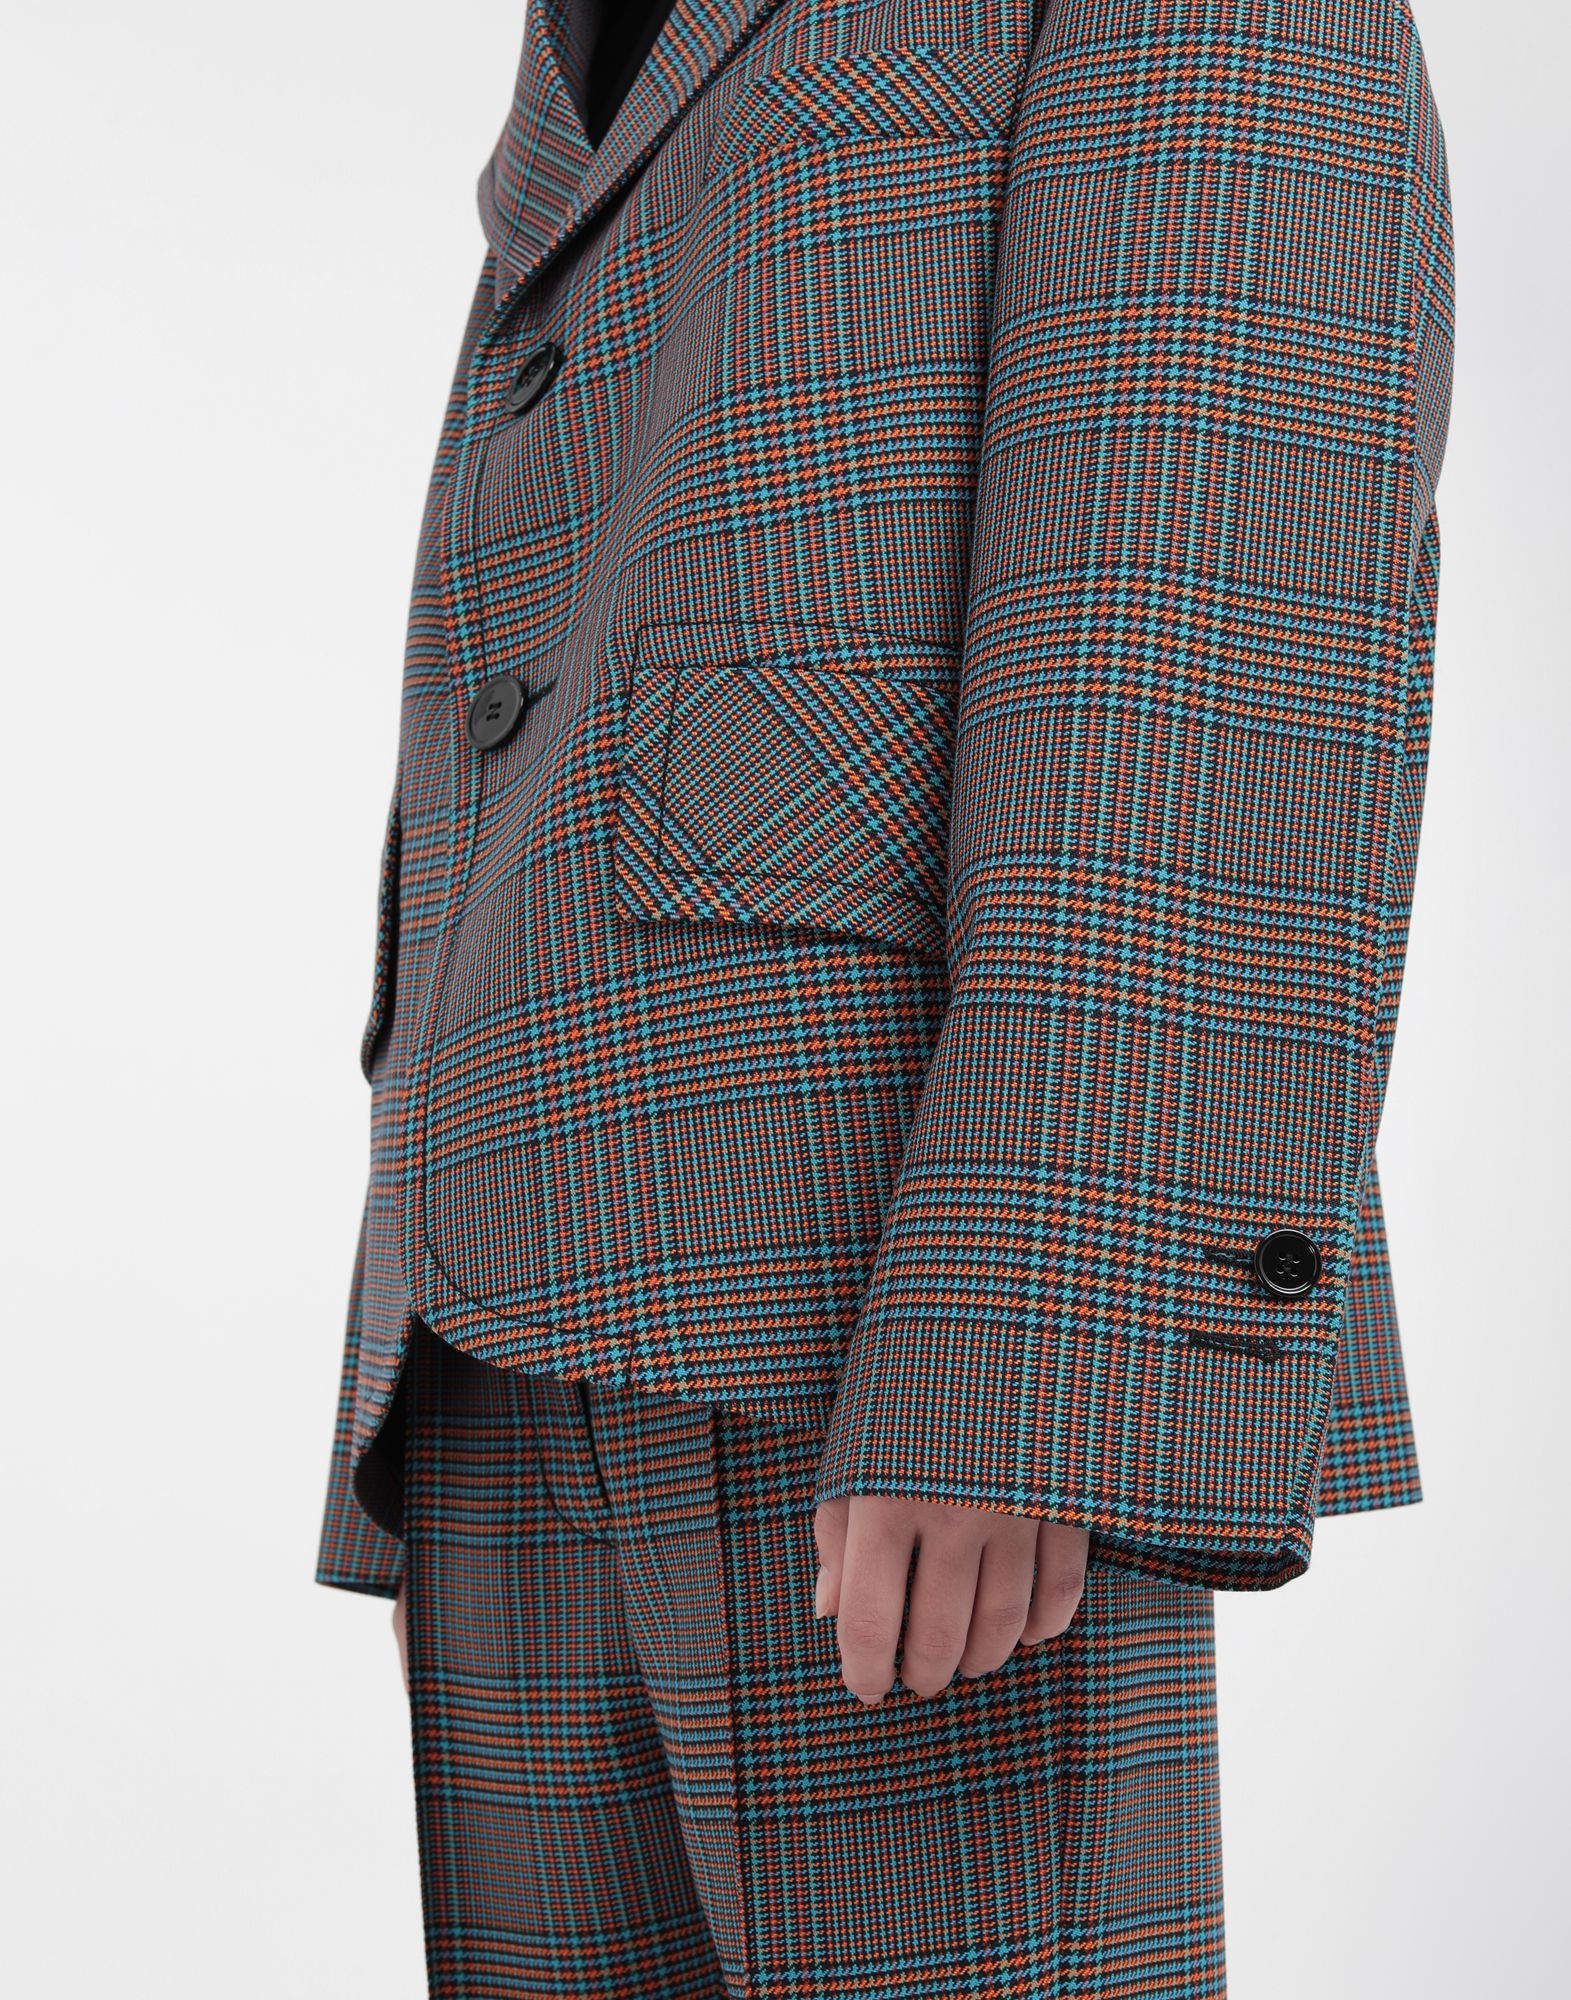 MM6 MAISON MARGIELA Oversized checked wool jacket Blazer Woman a